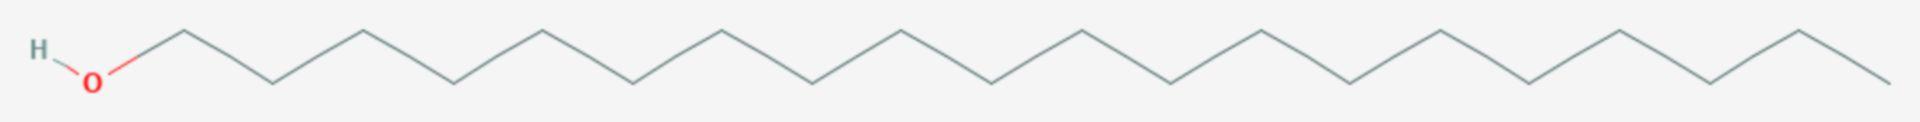 1-Eicosanol (Strukturformel)